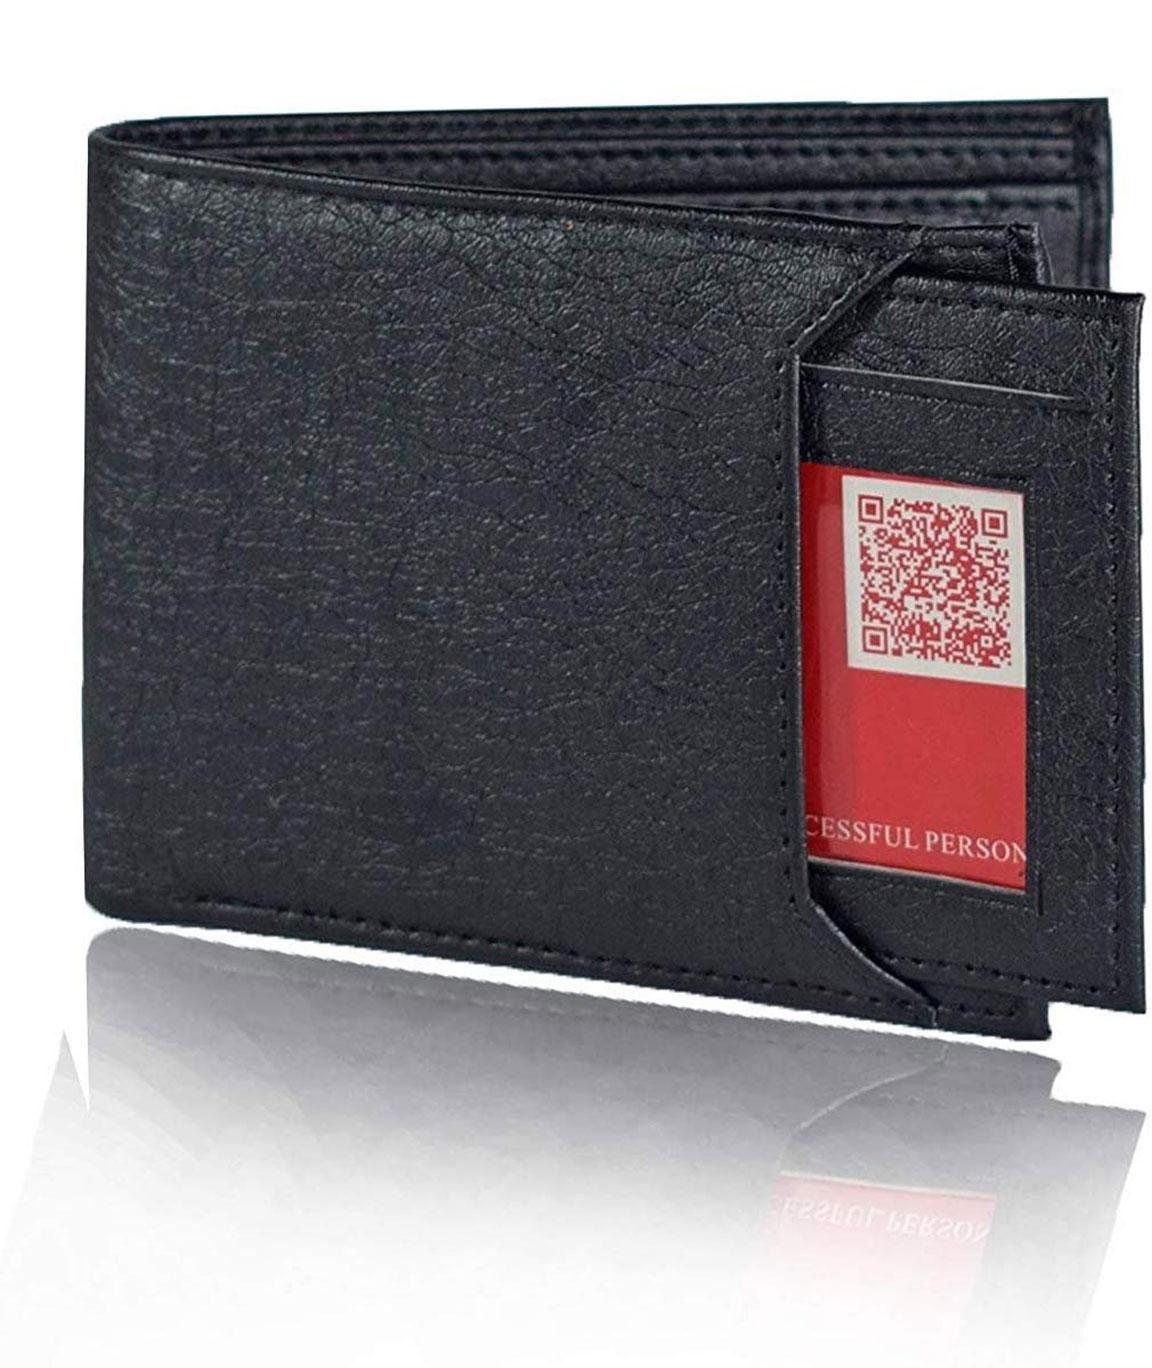 Urban alfami Mens Black Wallet, Purse for Men, Black Wallet